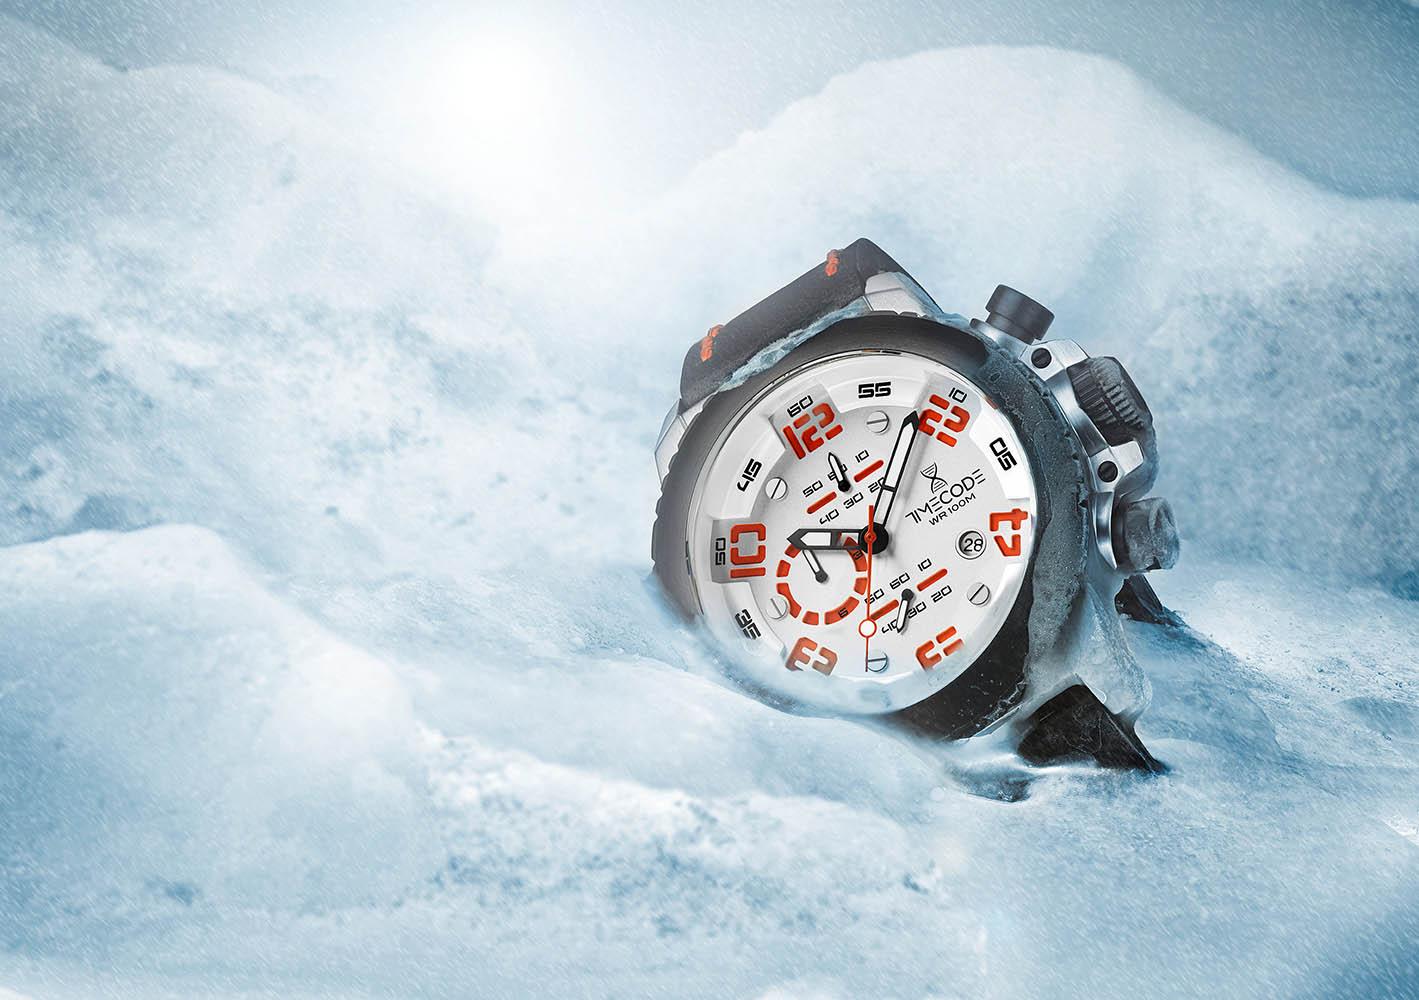 Timecode_watch_frozen_environment_photography_retouching